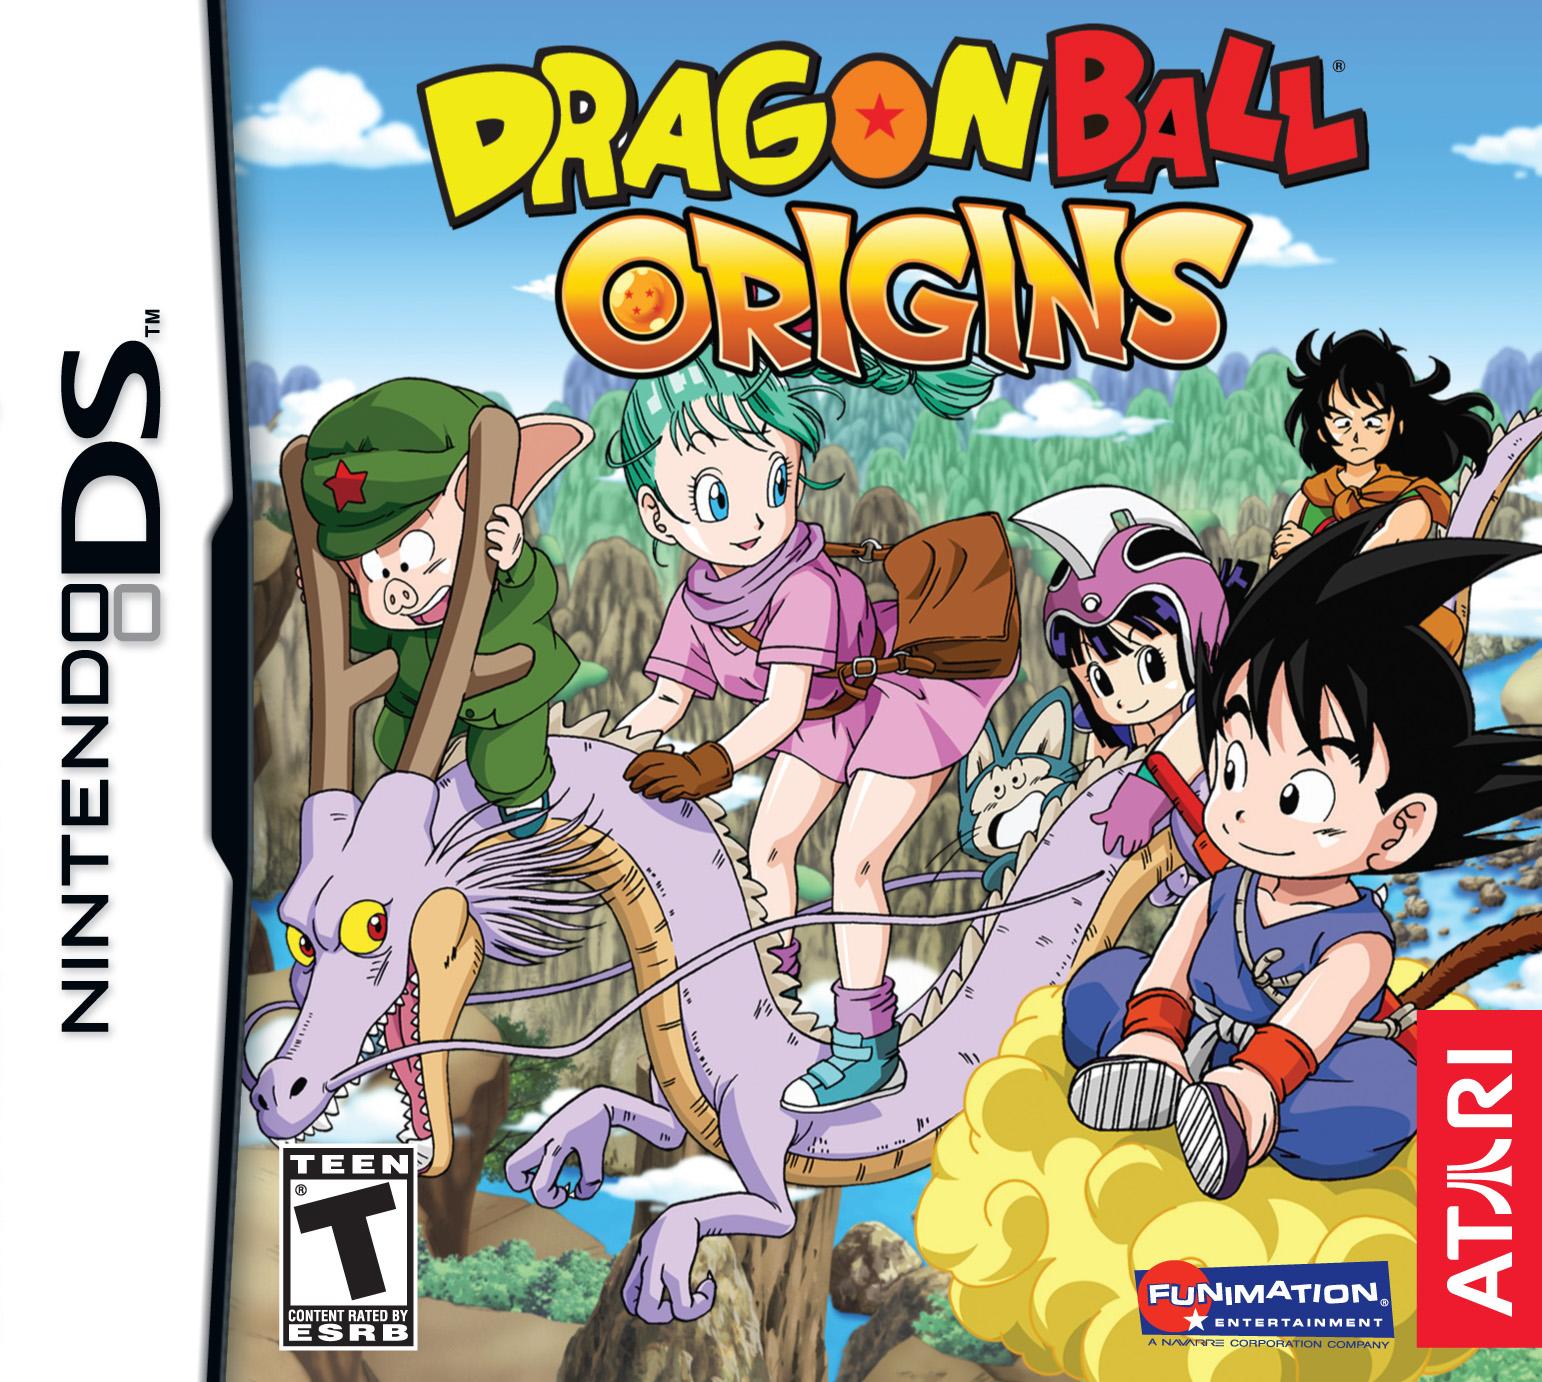 dragon ball z ds games